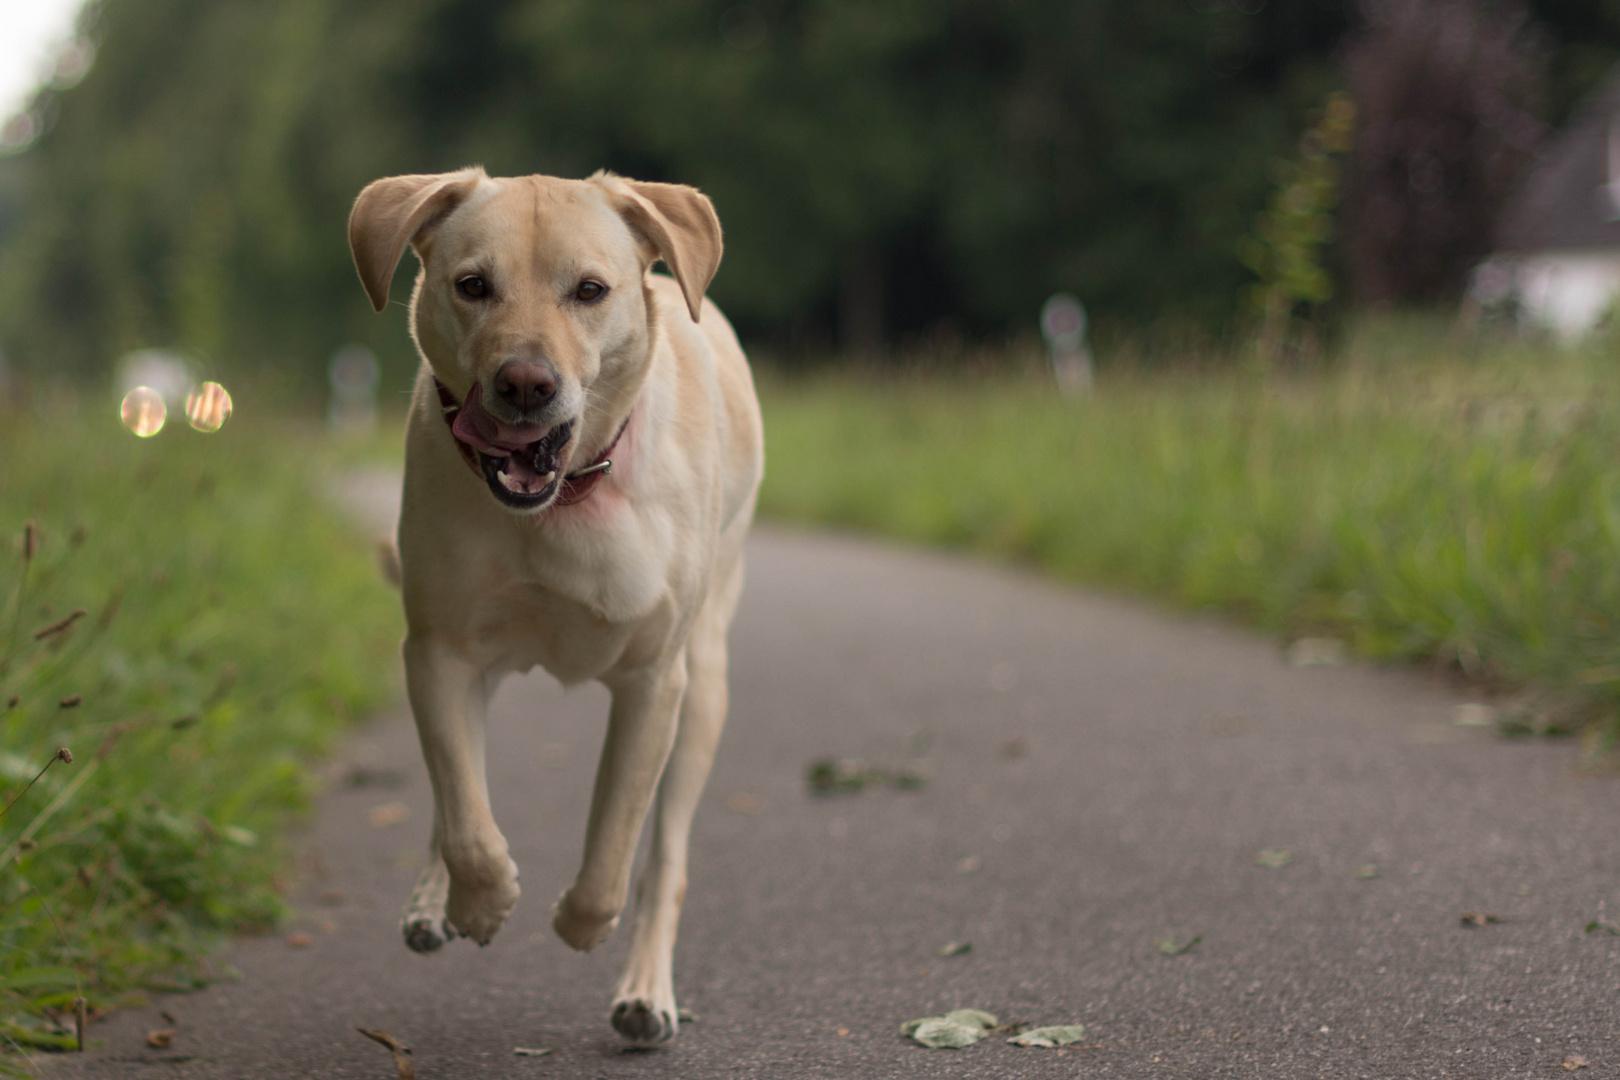 Roxy in the run.